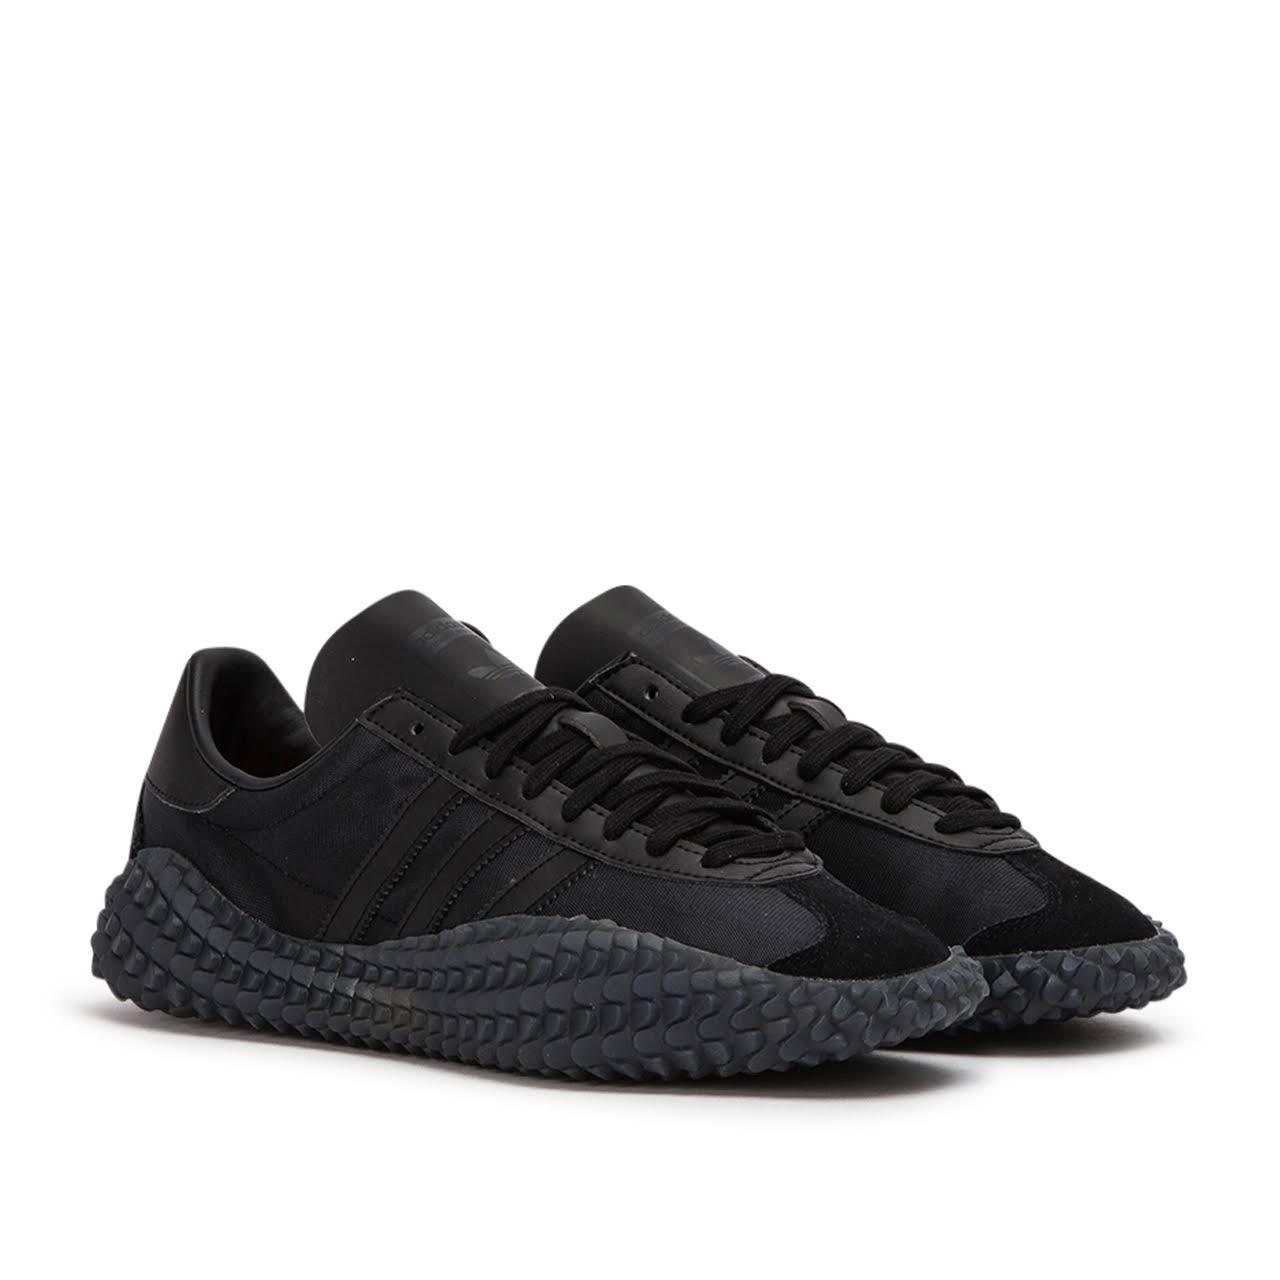 Country Negro Utilidad Kamanda Adidas X Made Never Pack anYq0O0dZ